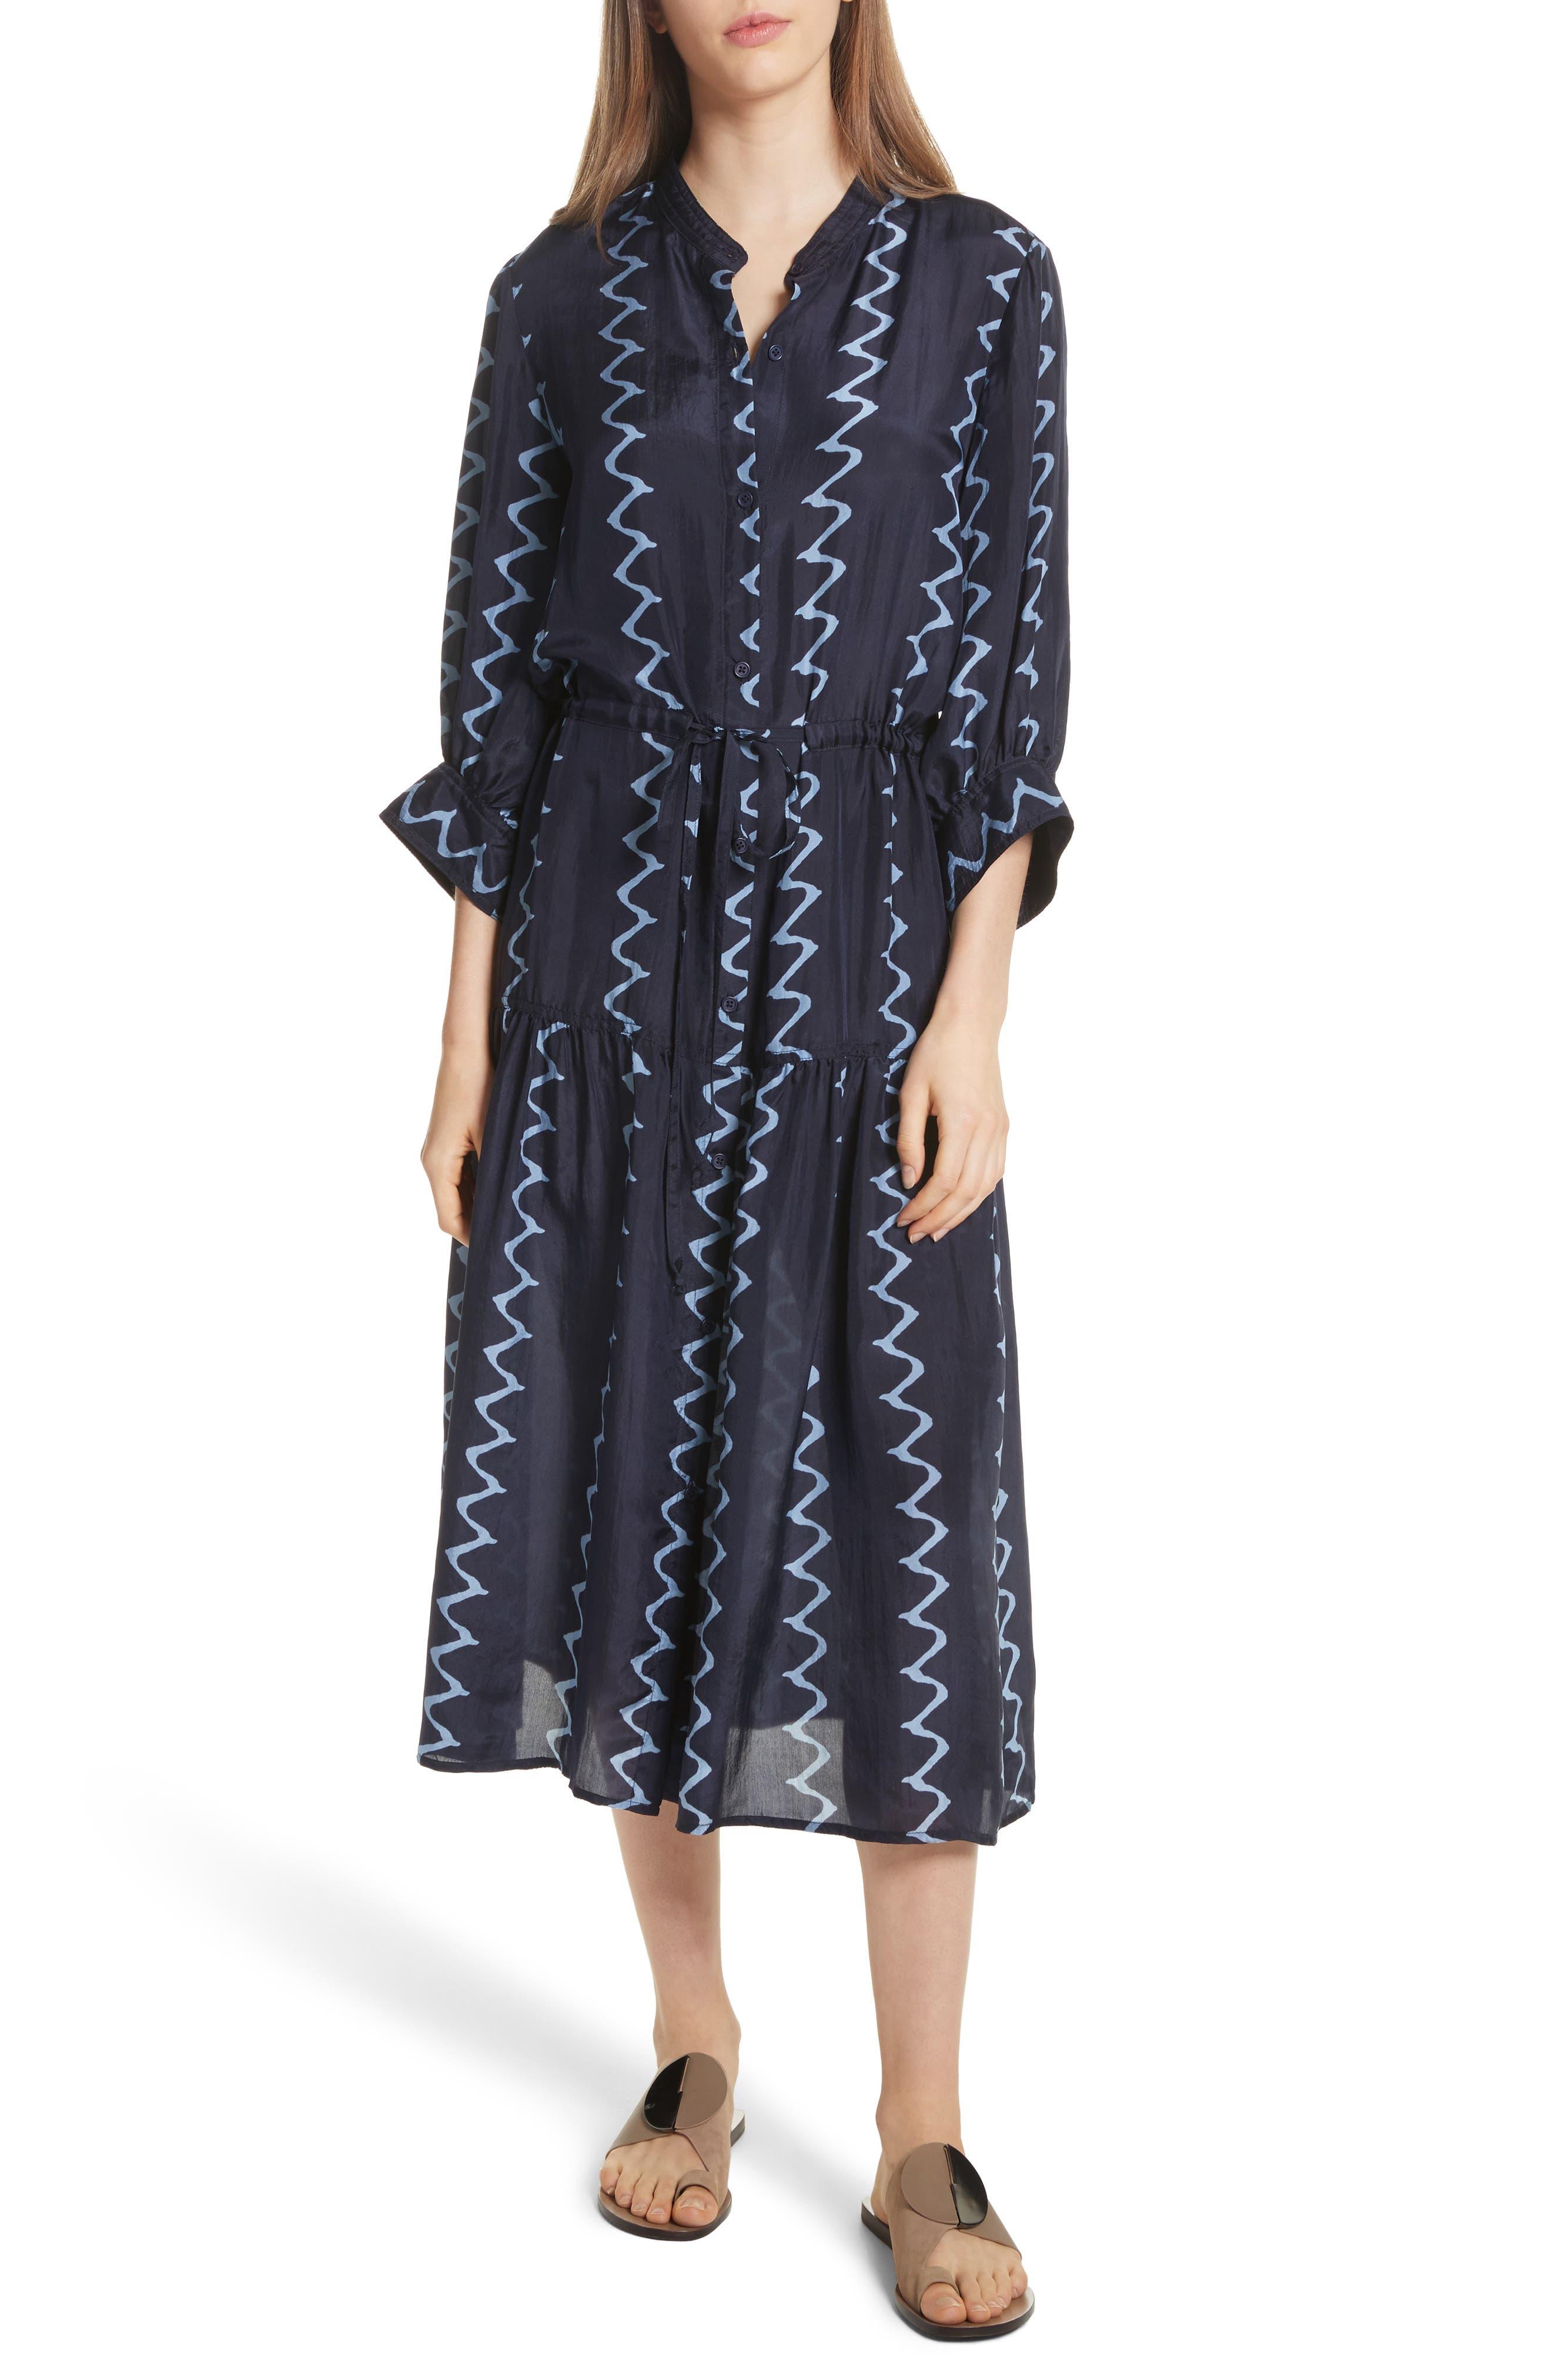 Alternate Image 1 Selected - Apiece Apart Dunegrass Silk Shirtdress